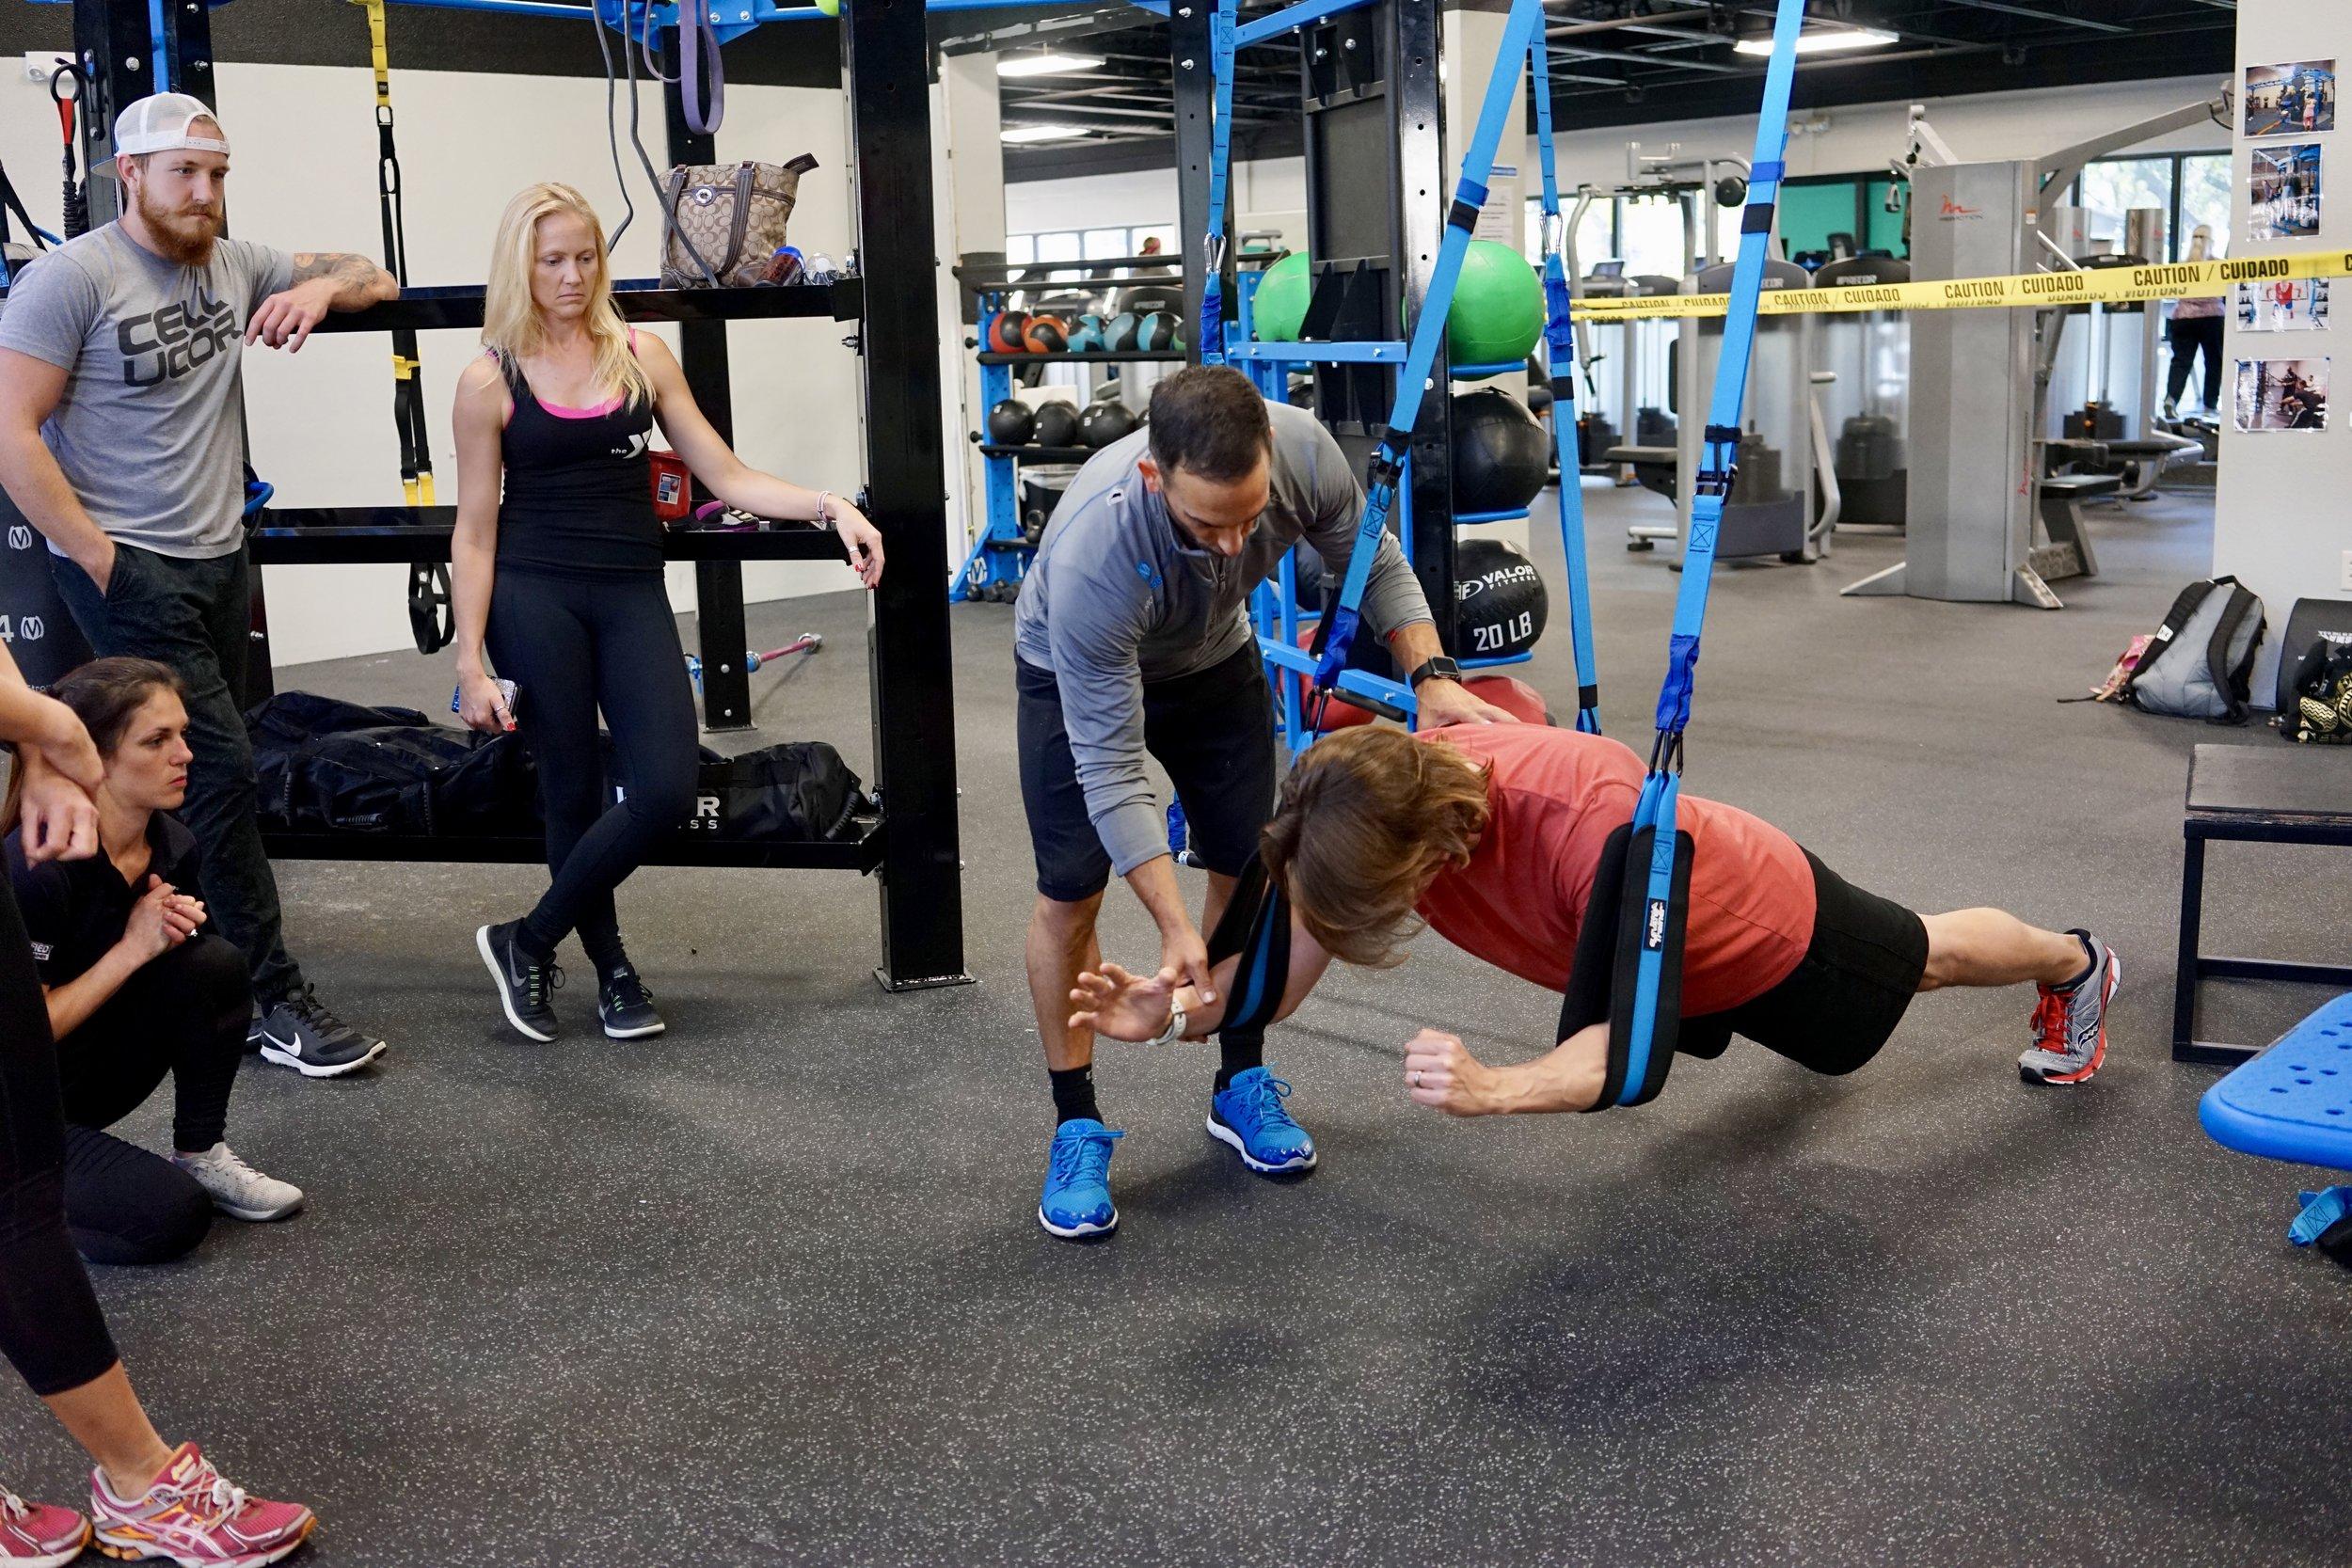 Elevate Trainer suspended planks